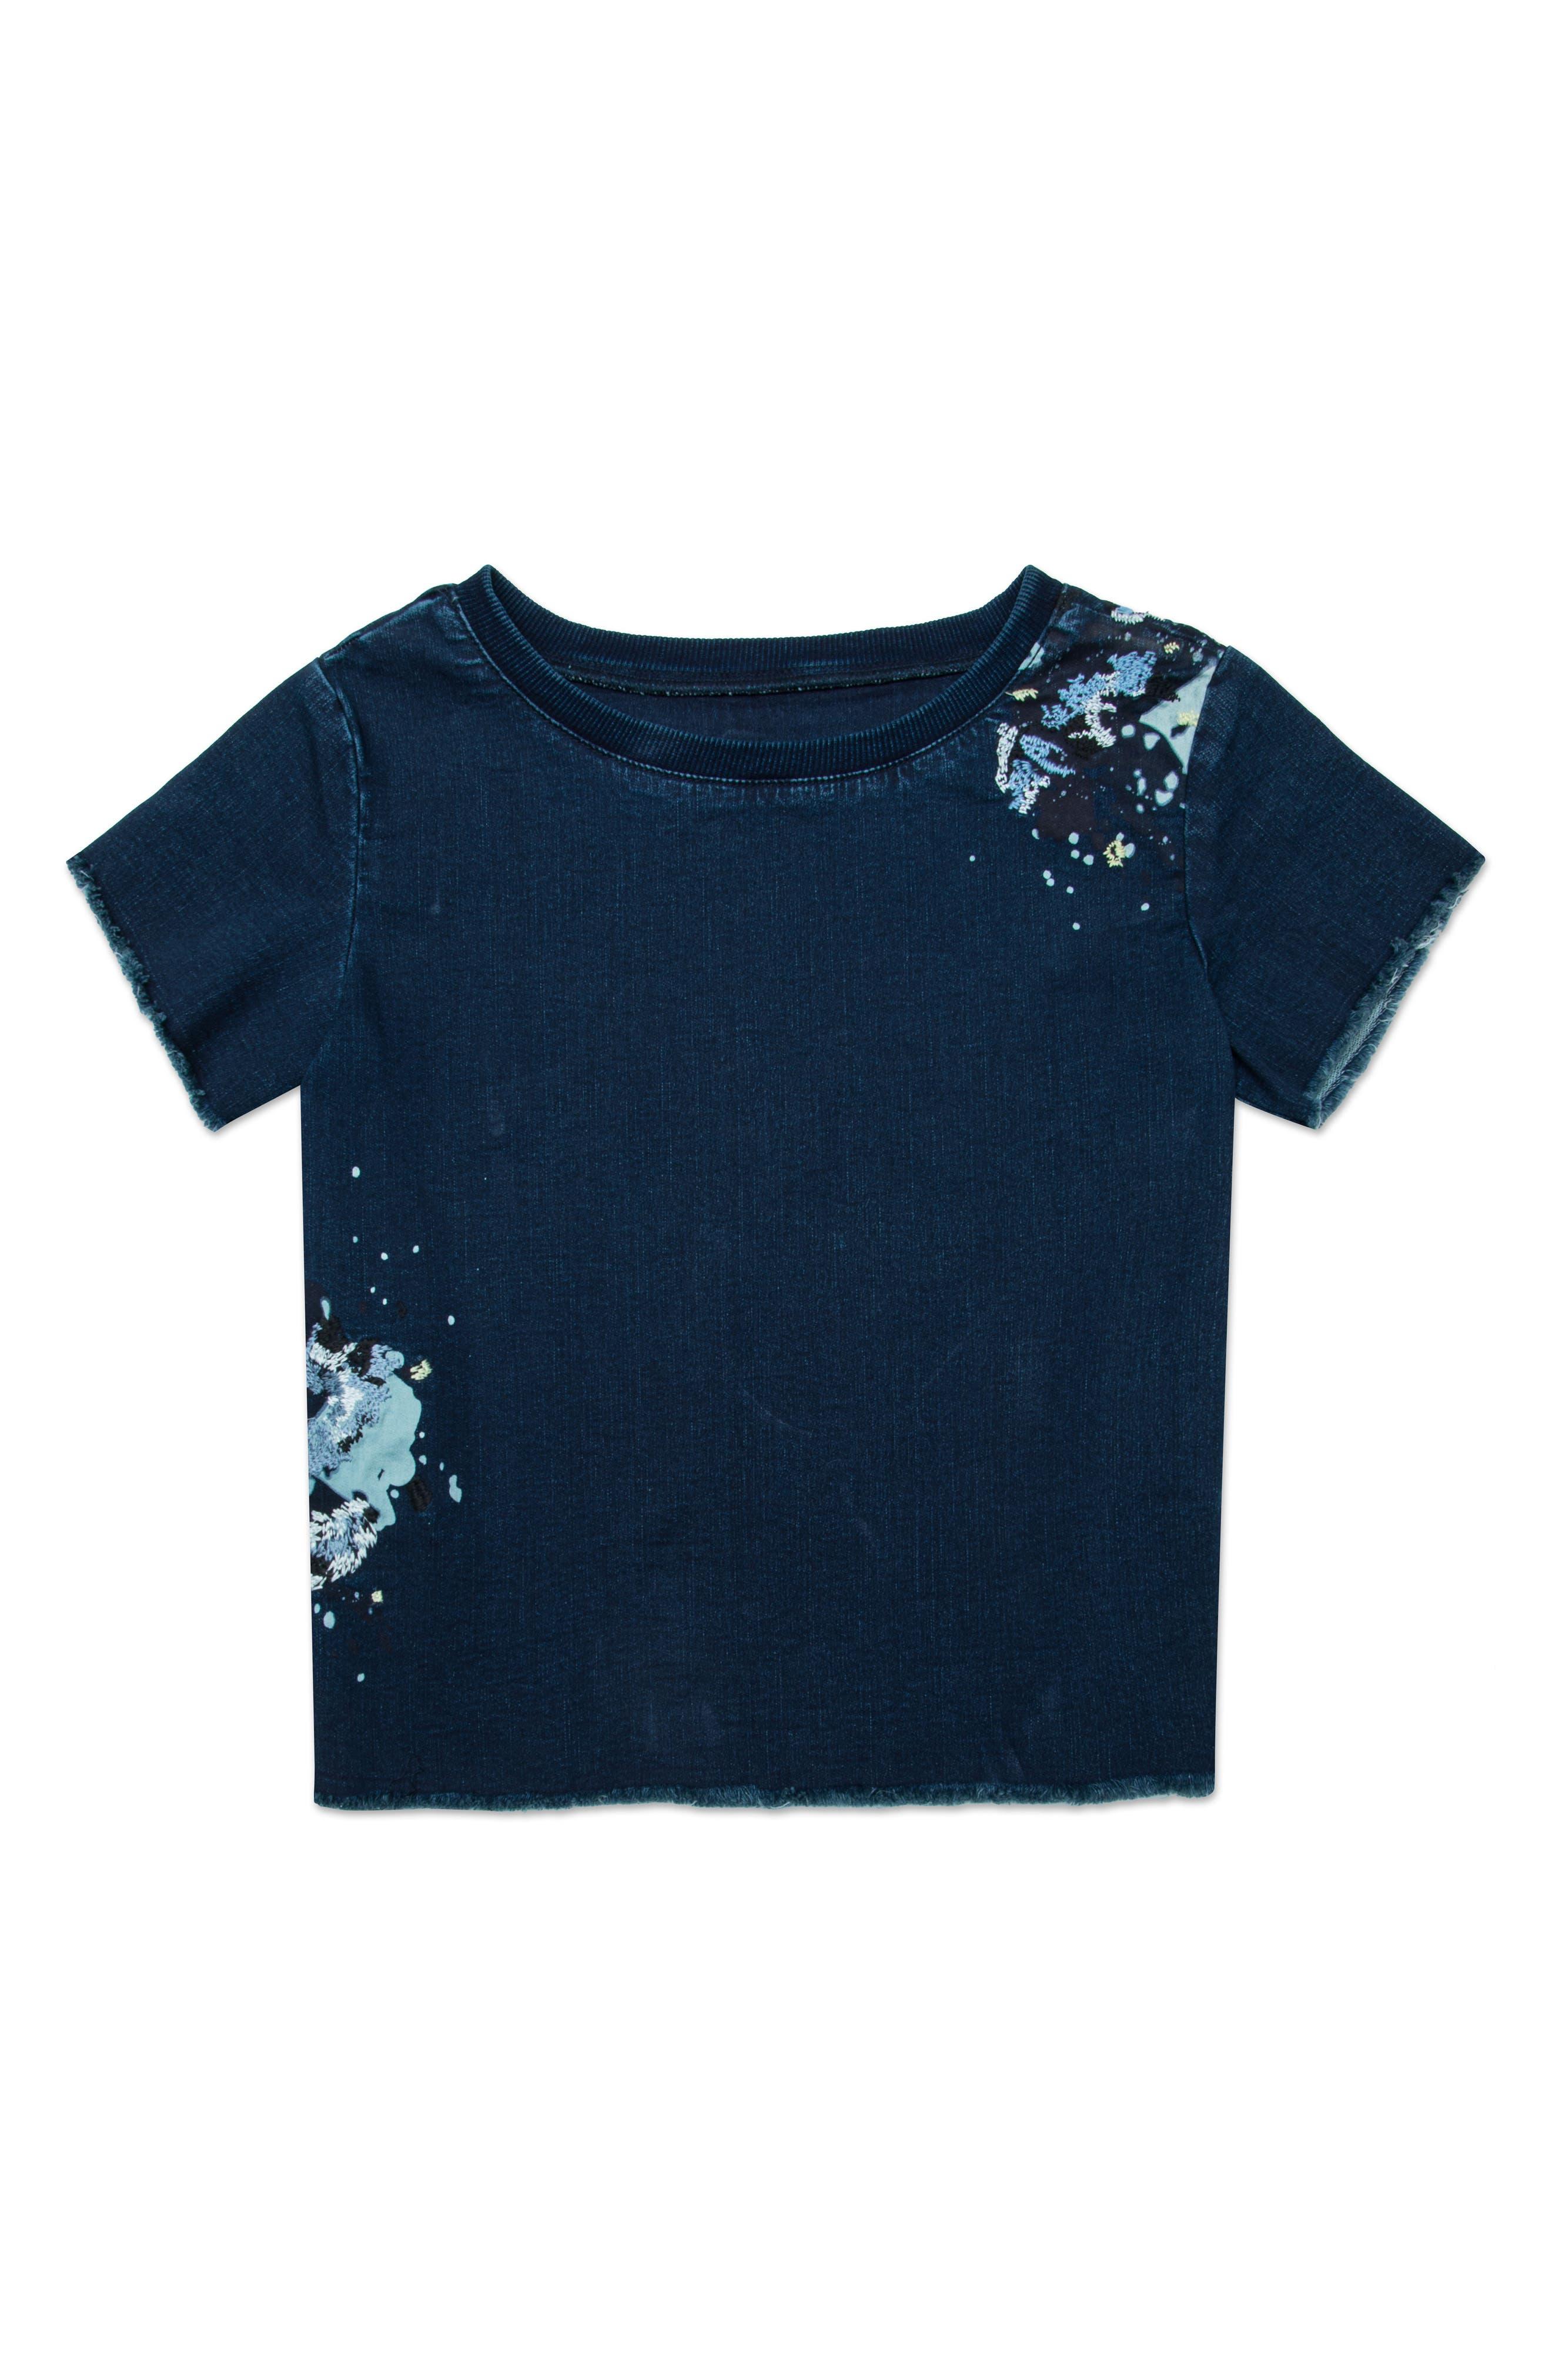 adriano goldschmied kids Embroidered Denim Top,                         Main,                         color, Splash Away